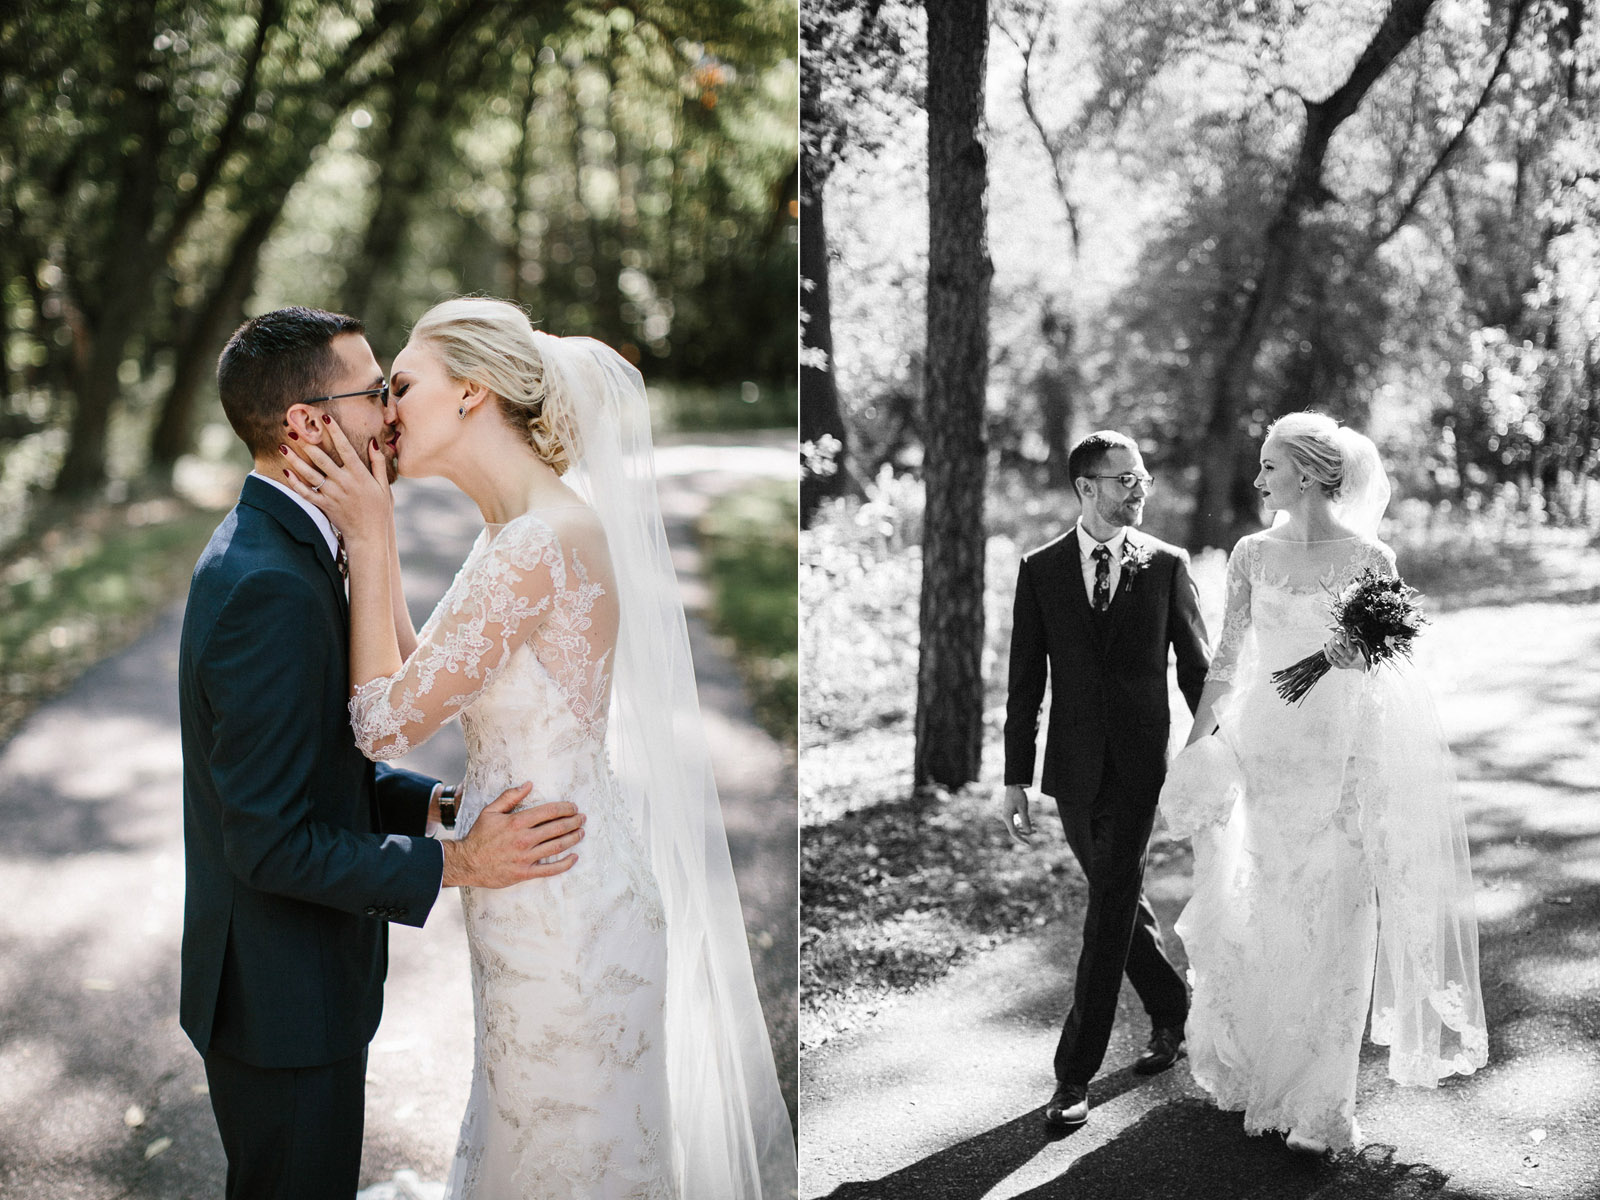 Jenna&Austin_SiouxFalls_Wedding_Photographer_038.jpg